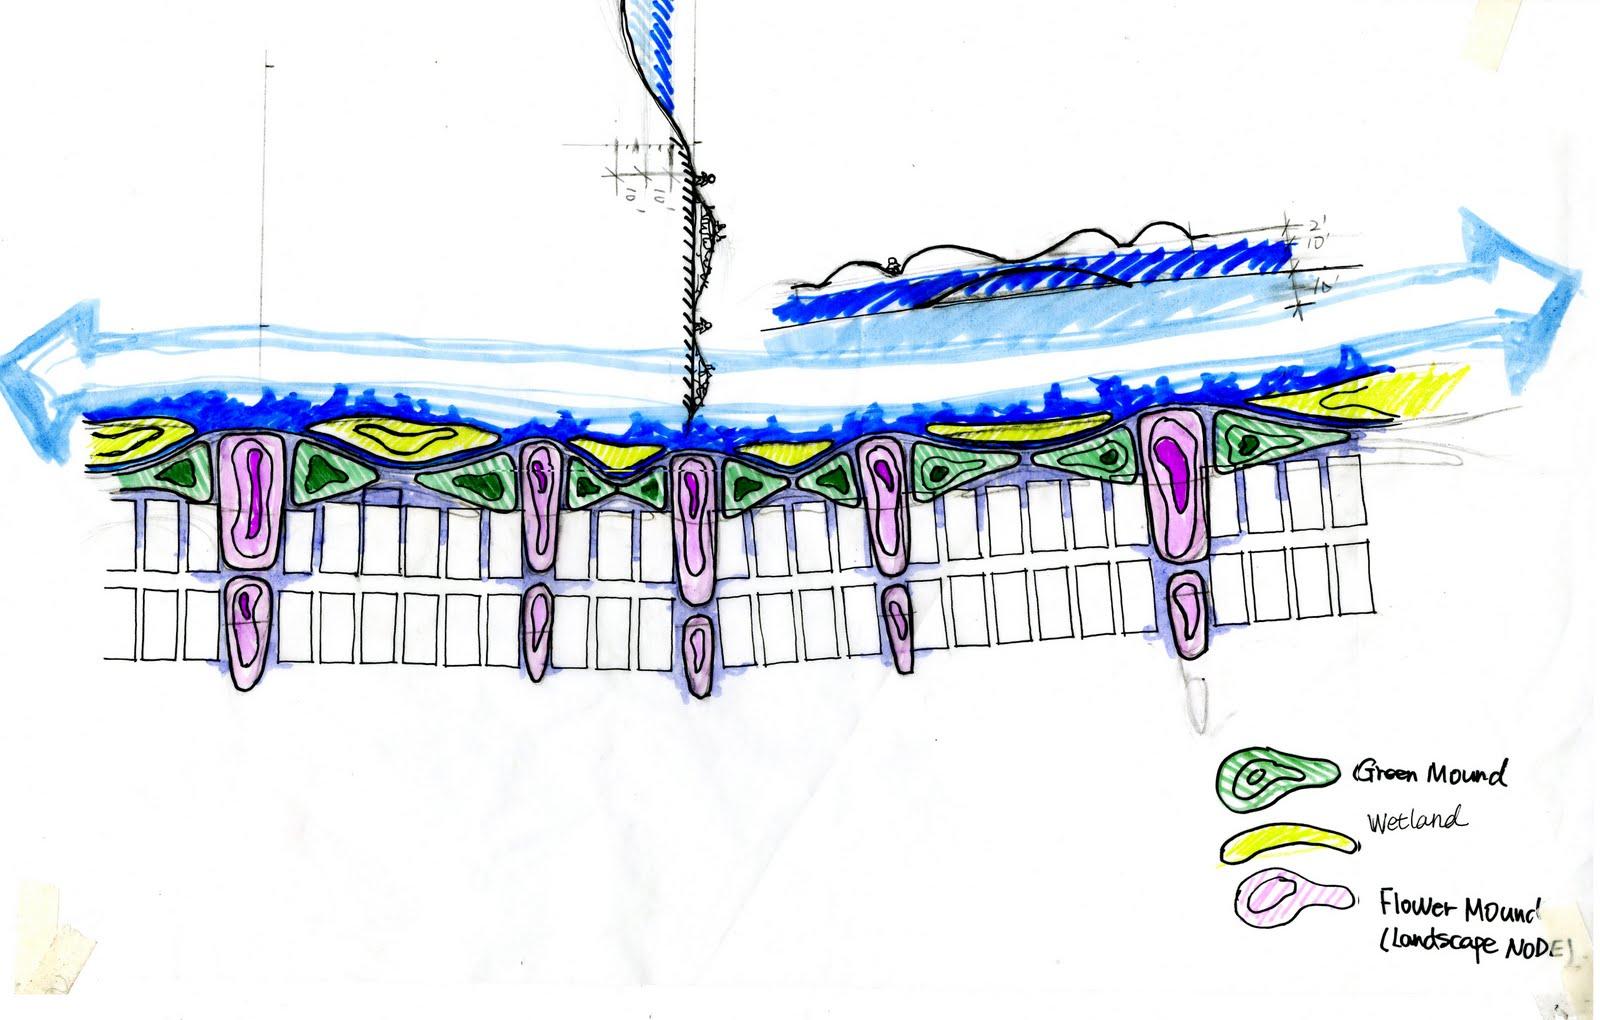 1600x1020 agropolitanstudio anam,new city dynamic waterfront